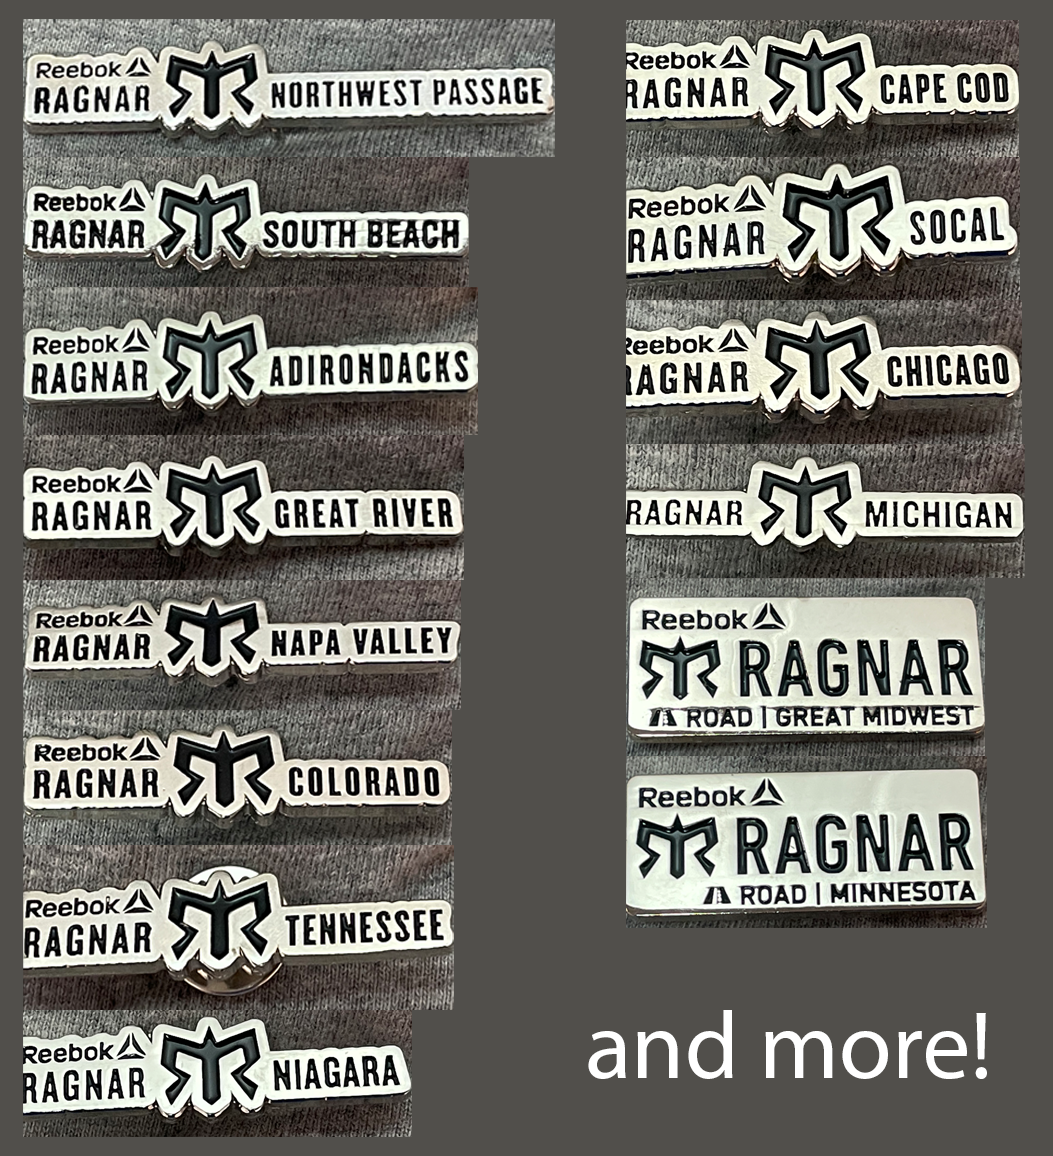 Event Specific Pin - Reebok Ragnar